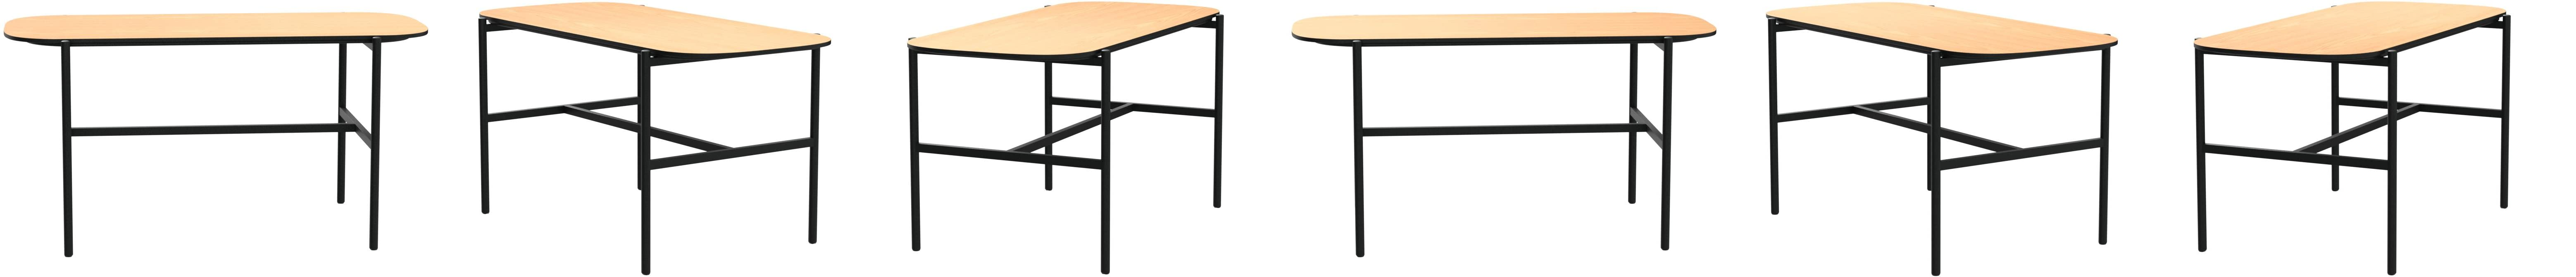 End Table Walnut Effect Movian Kyyvesi Brand 40 x 40 x 40 cm